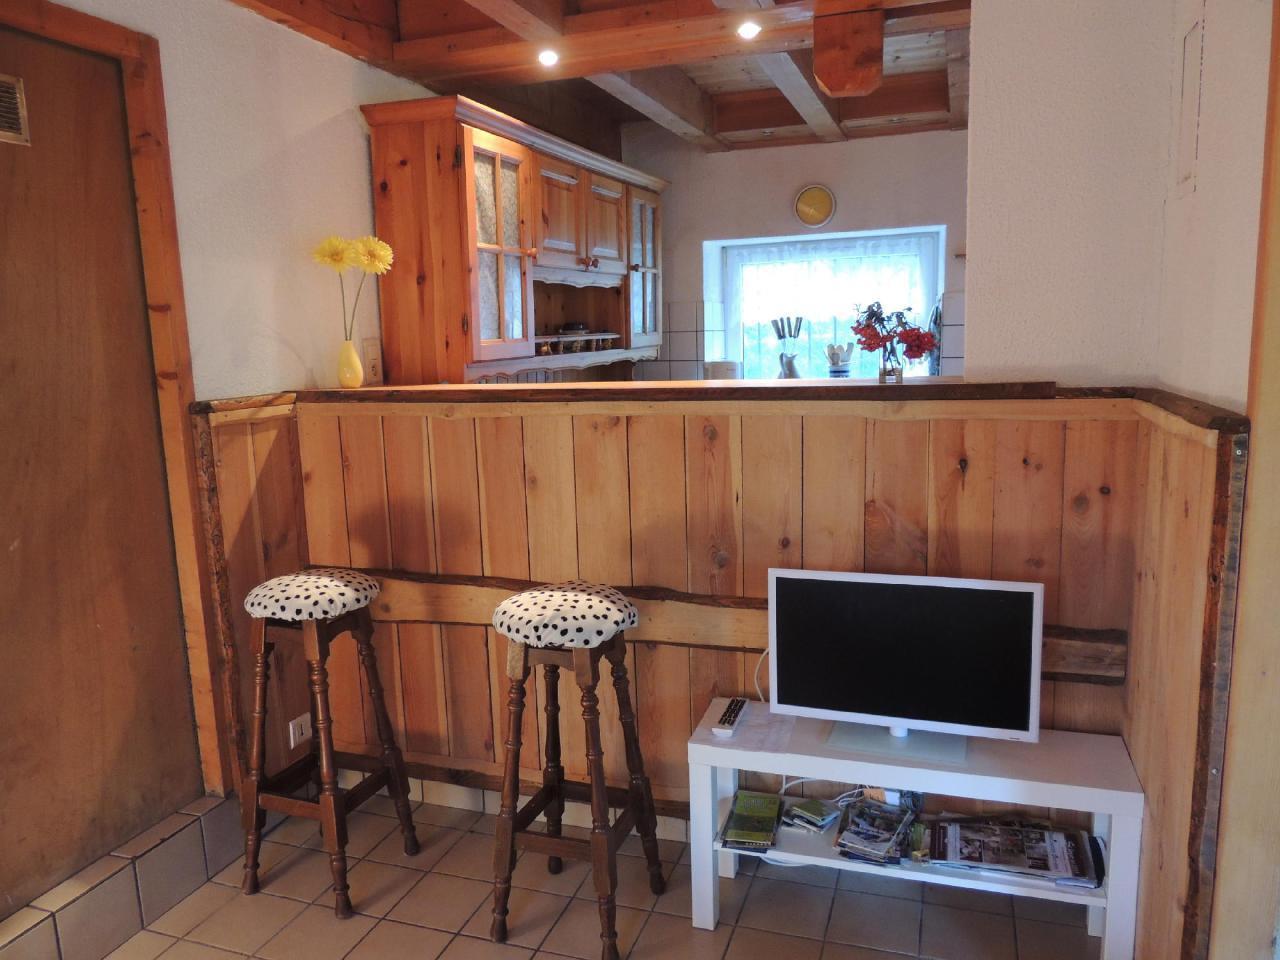 Ferienhaus Steinhäuschen Shila, im Naturparc der Vogesen,  mit Saunahaus (1717460), La Rosière, Haute-Saône, Franche-Comté, Frankreich, Bild 8